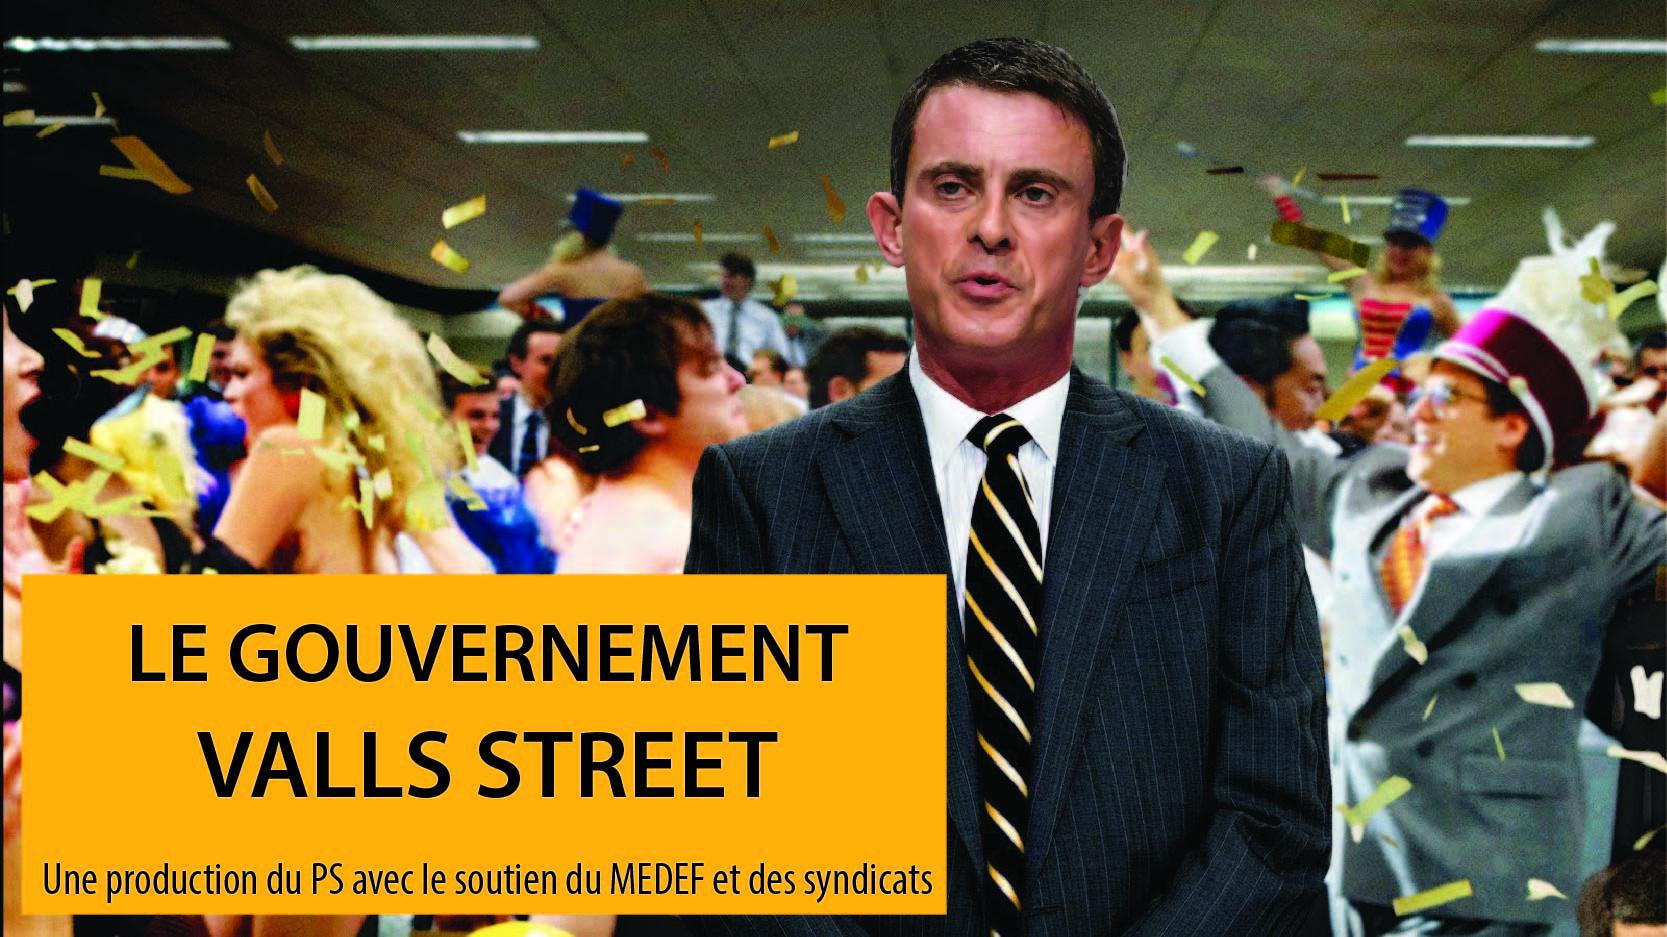 Valls Street